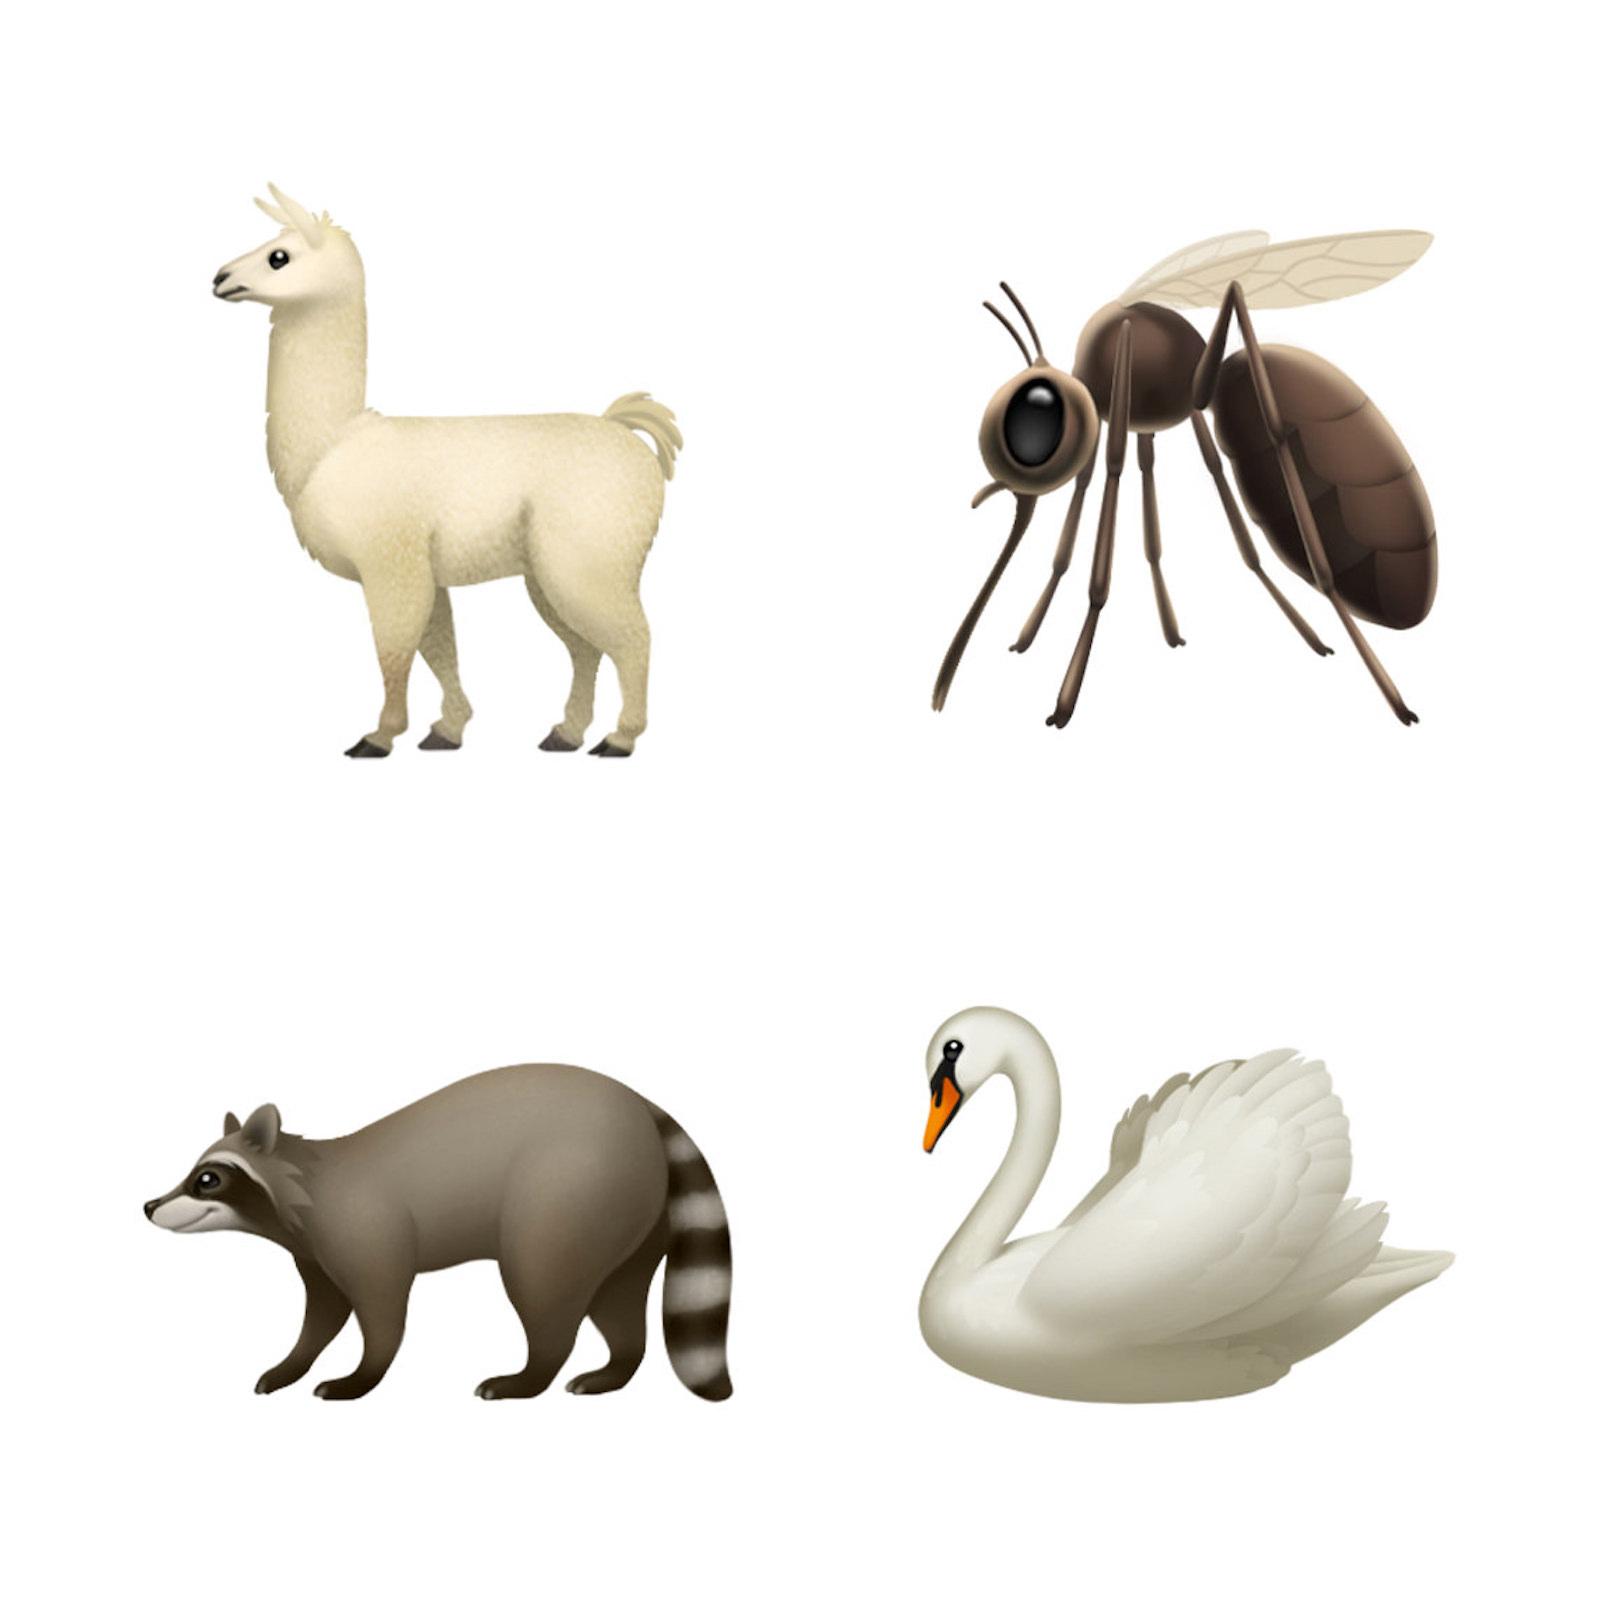 ios-121-emoji-update-llama-mosquito-swan-raccoon-10012018.jpg